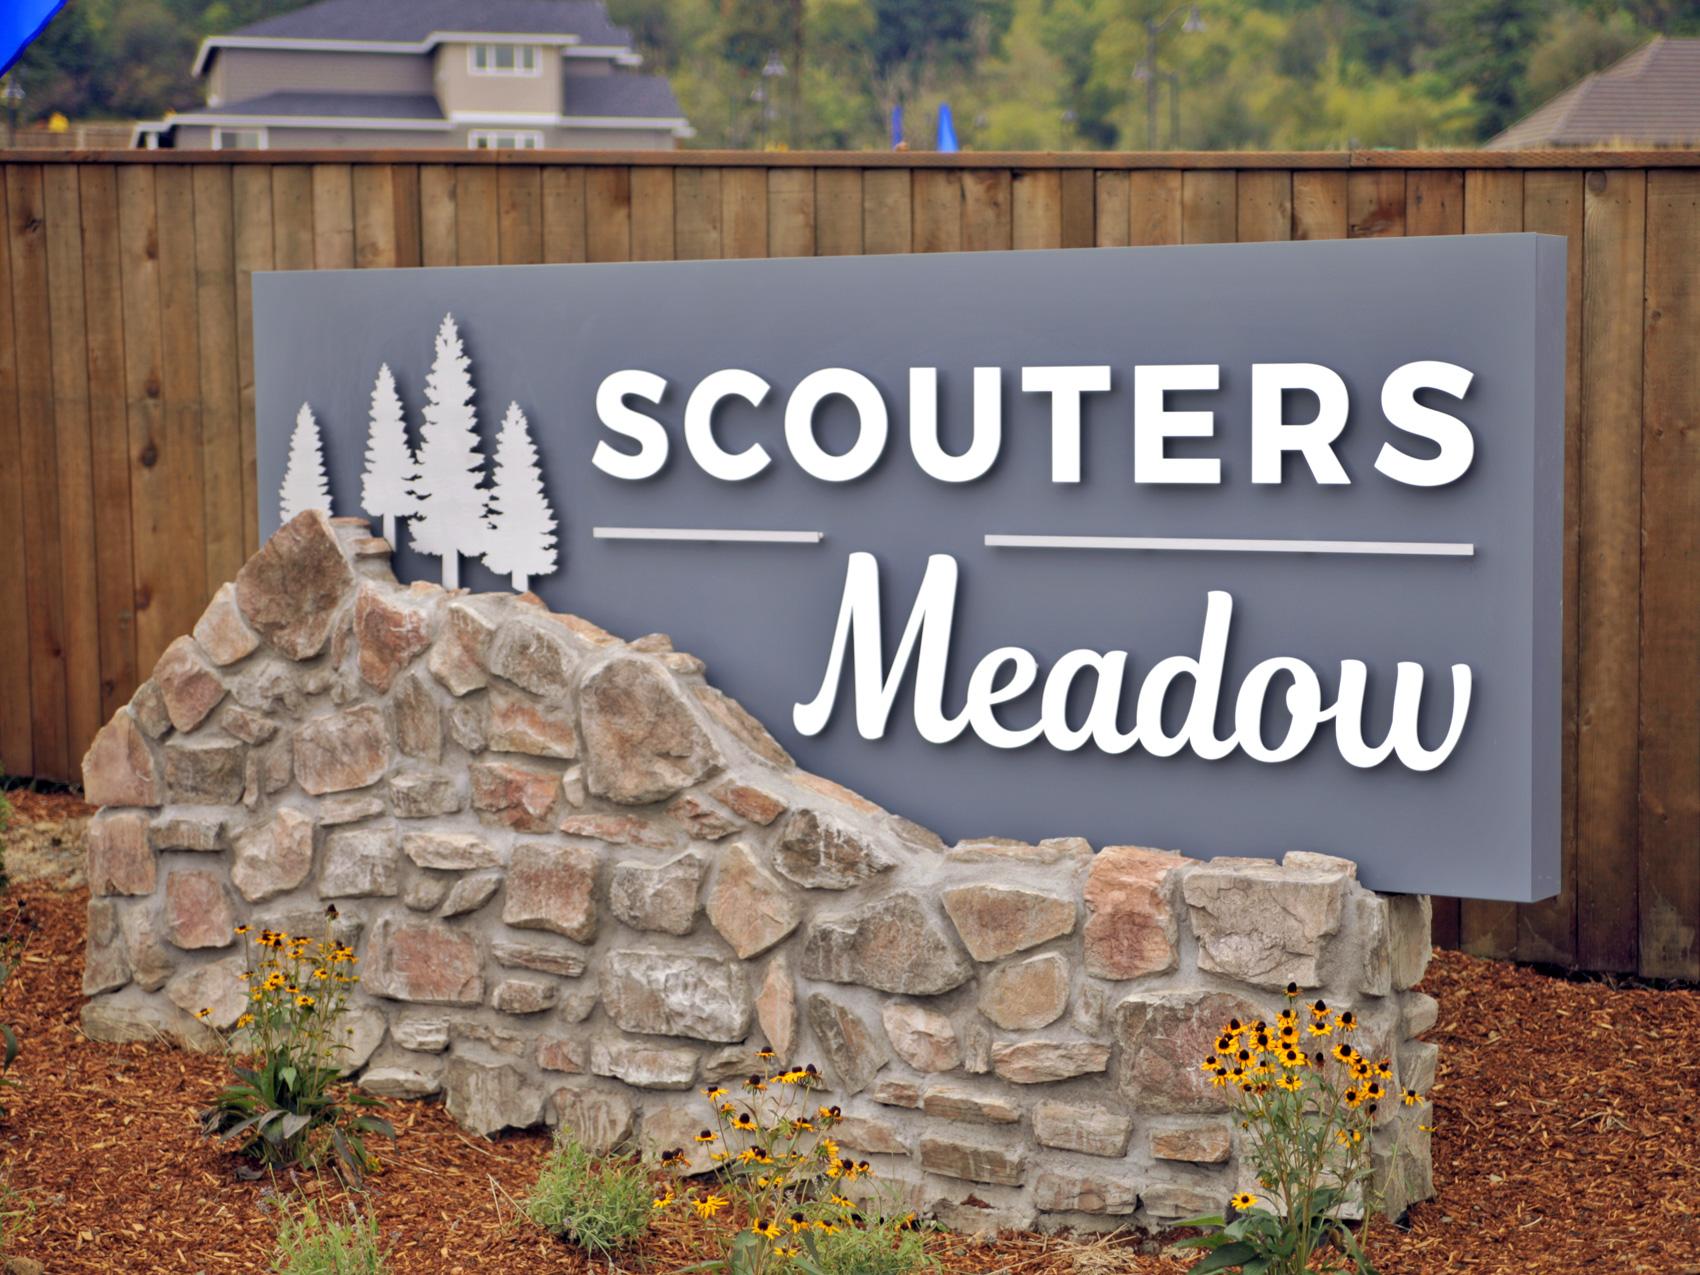 Holt_Scouters-Meadow_01.jpg